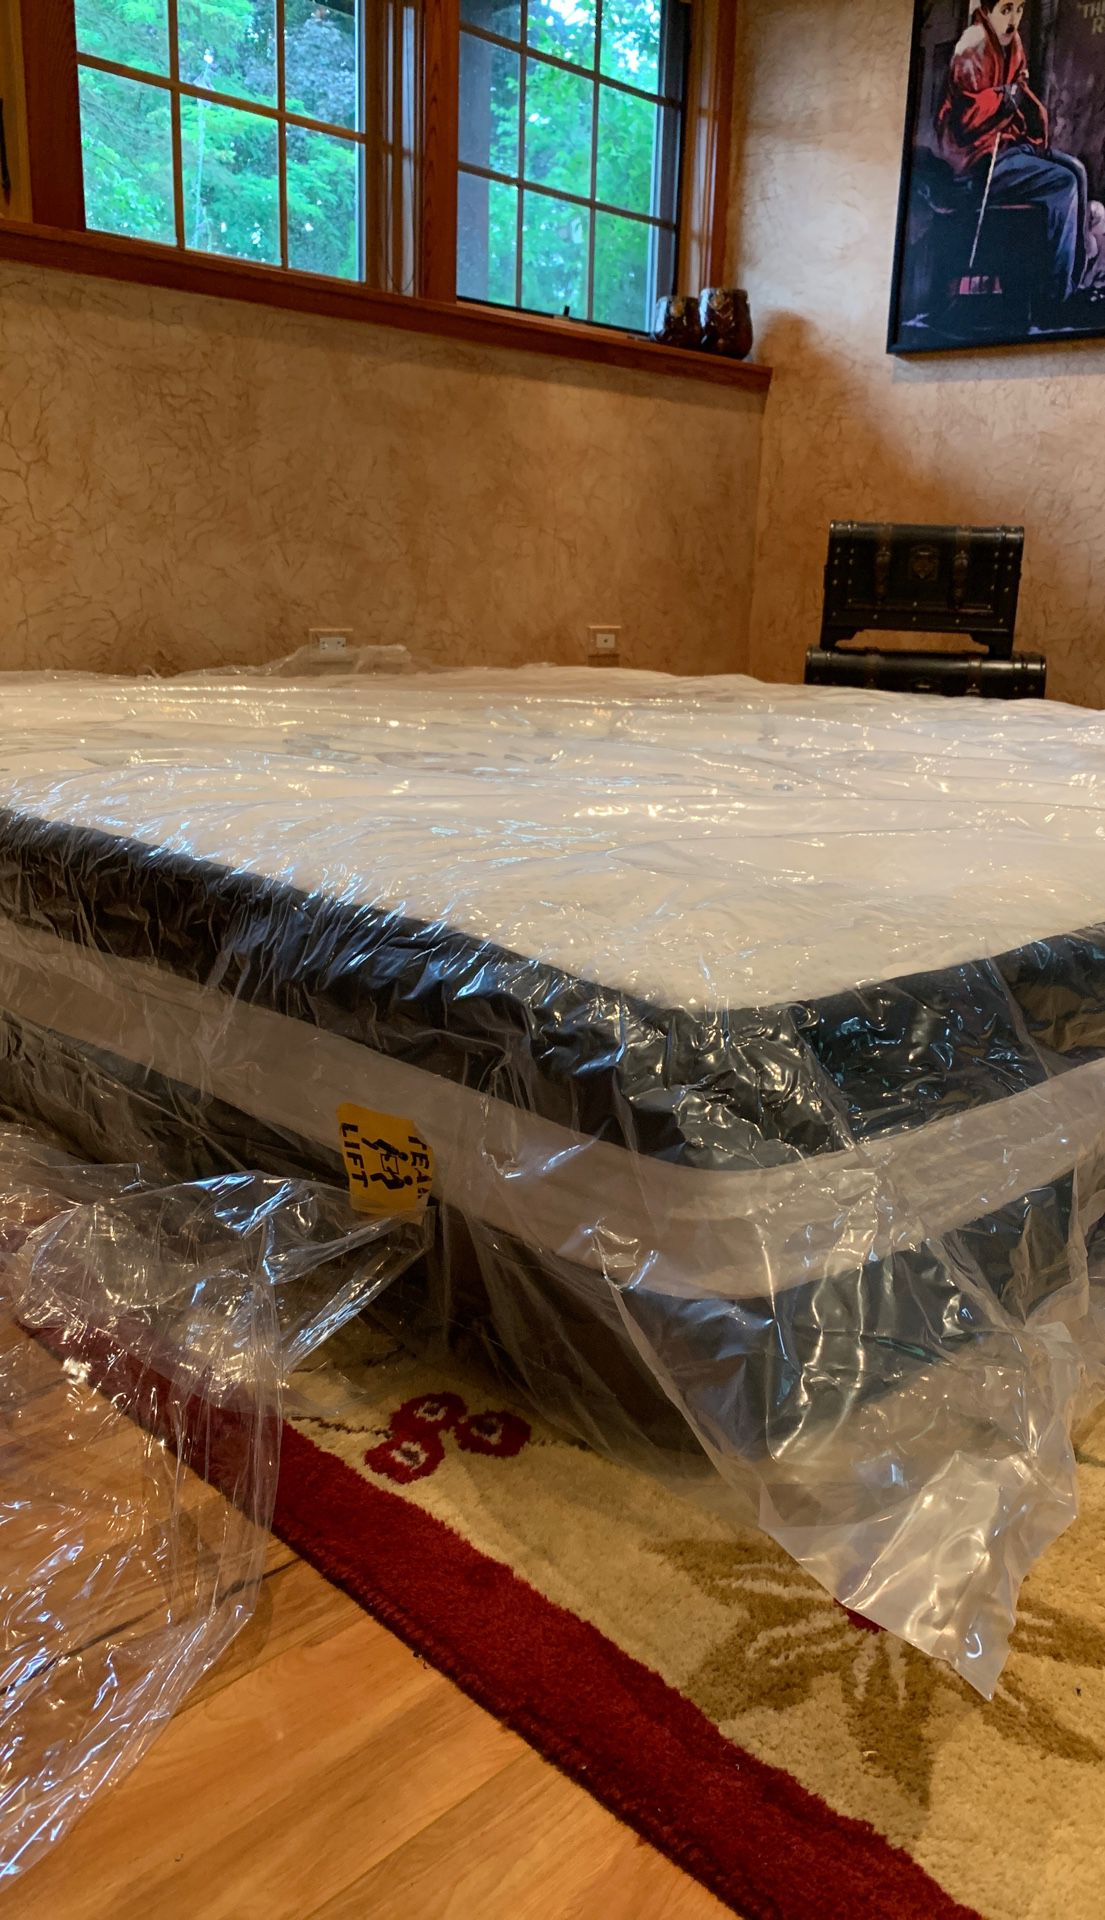 "12"" foam and pocket spring mattress, king size"